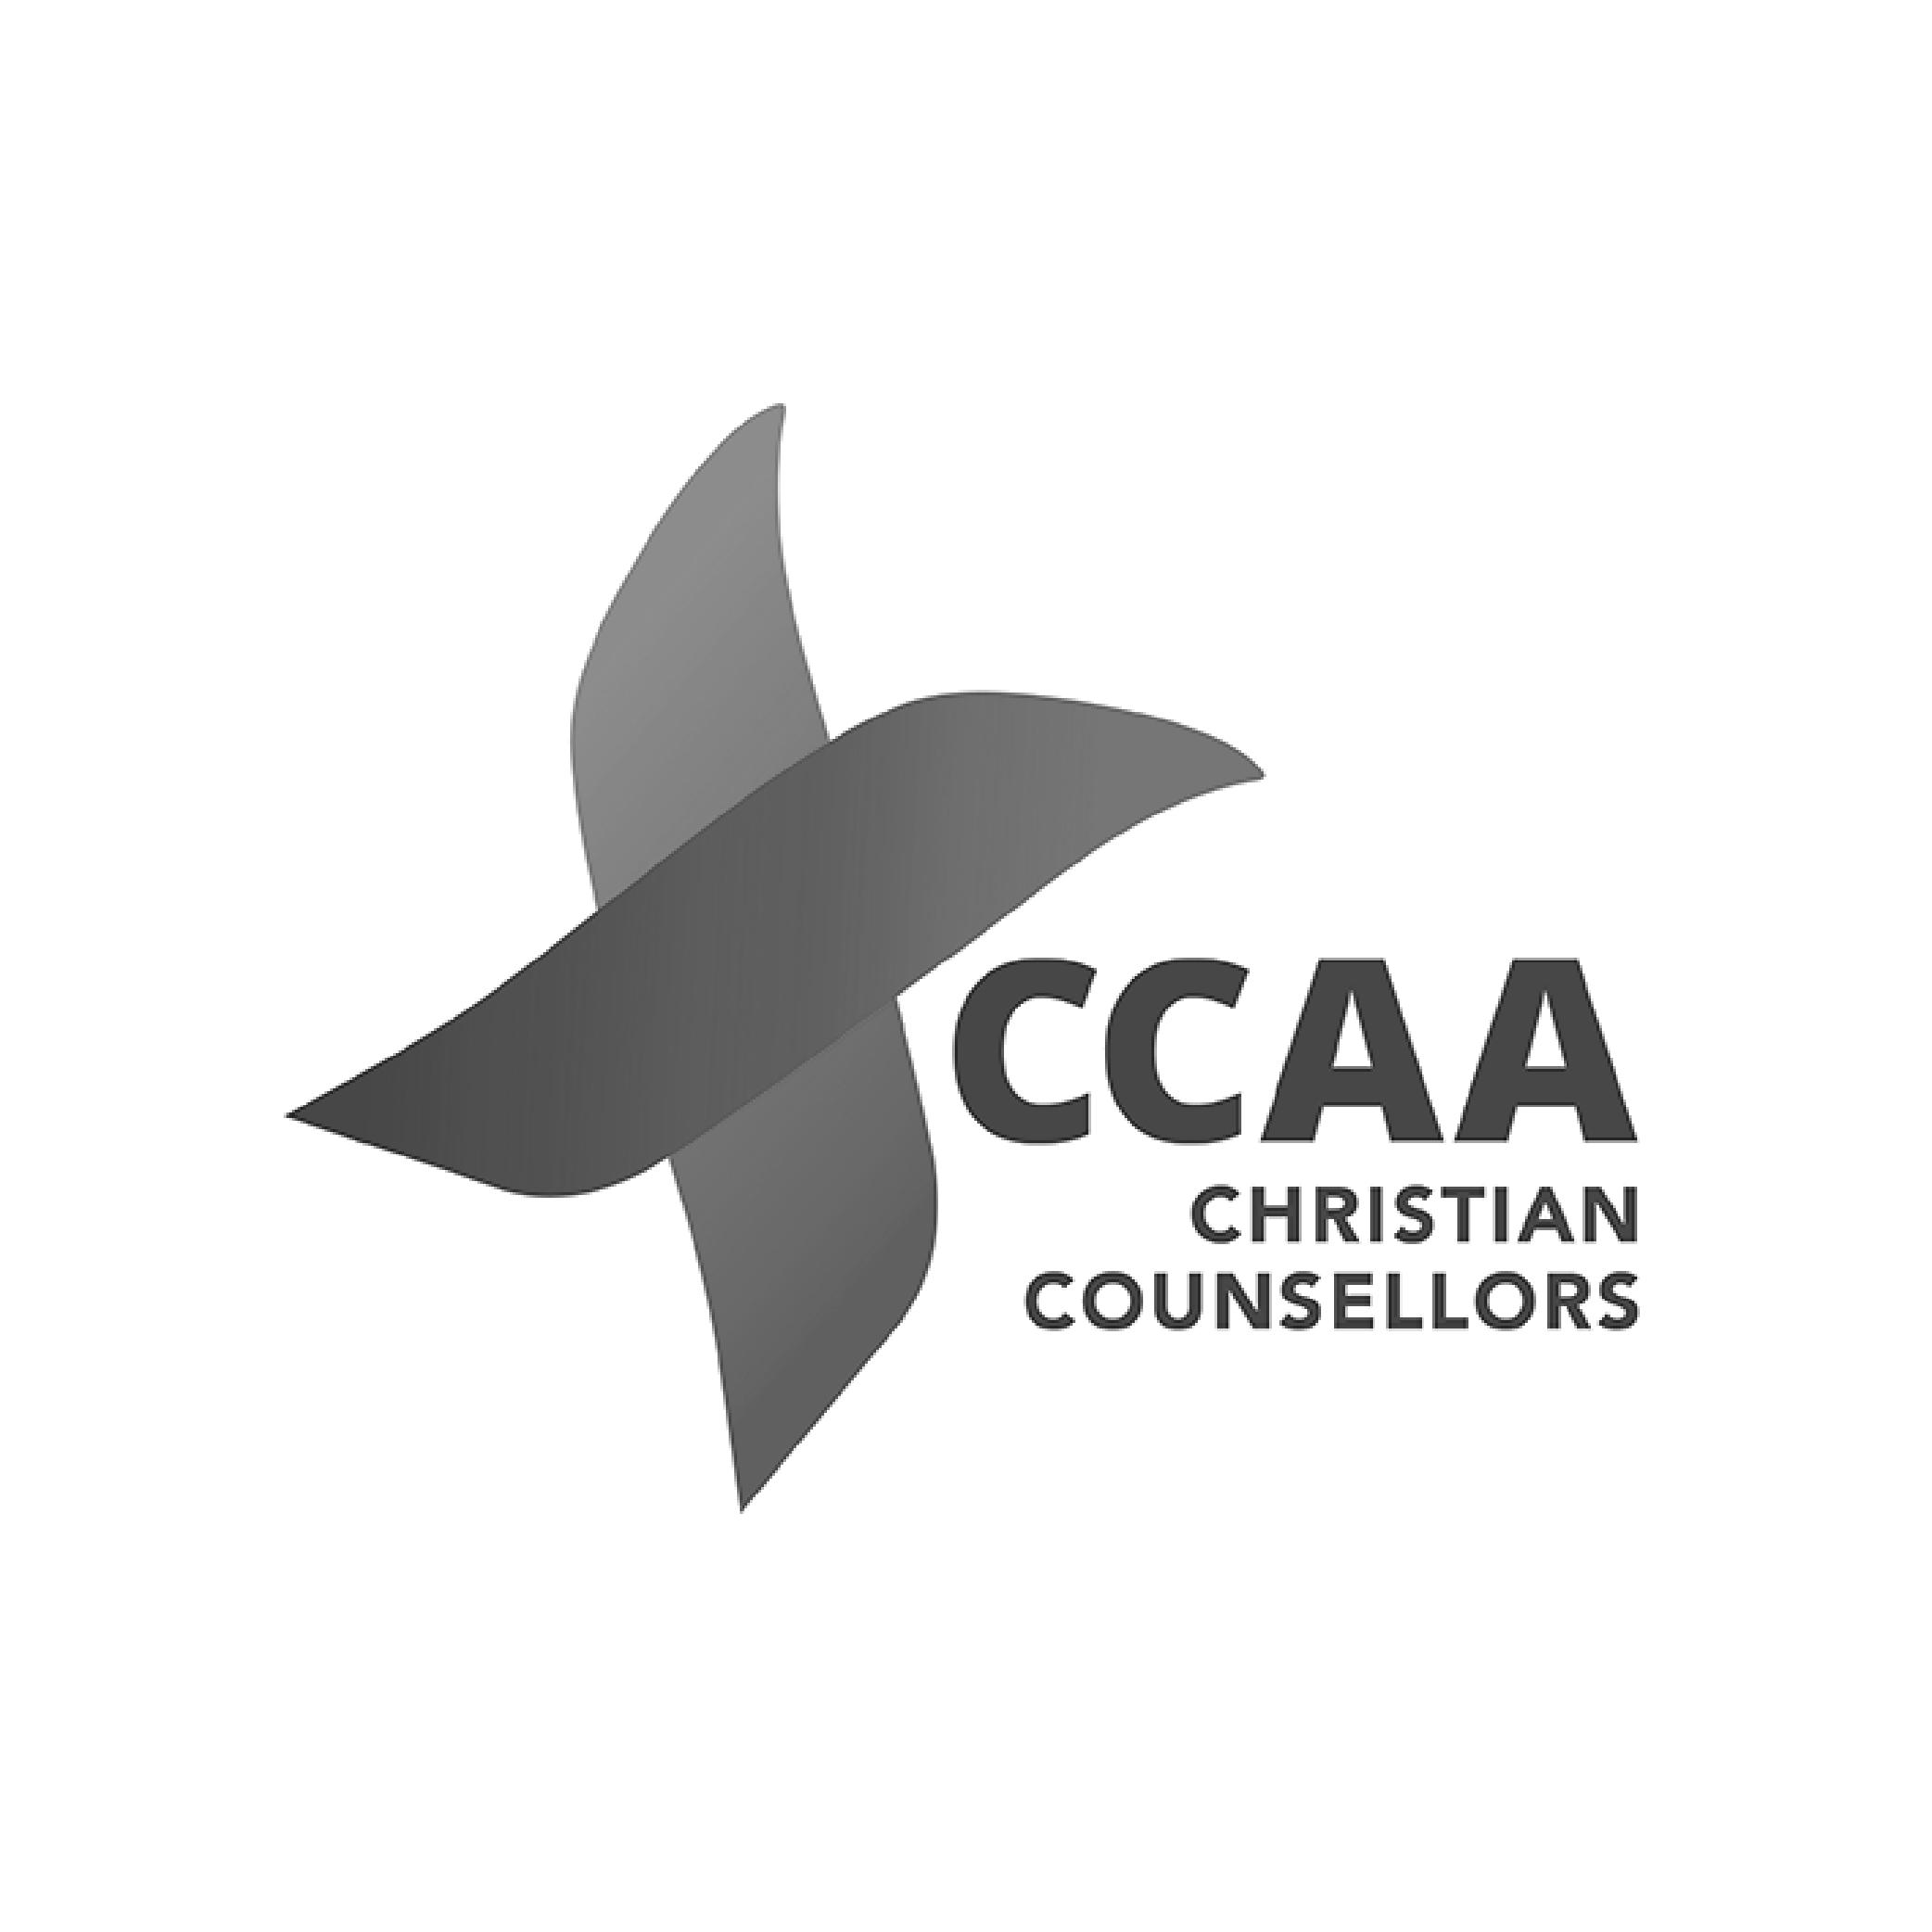 College Logos Square-CCAA